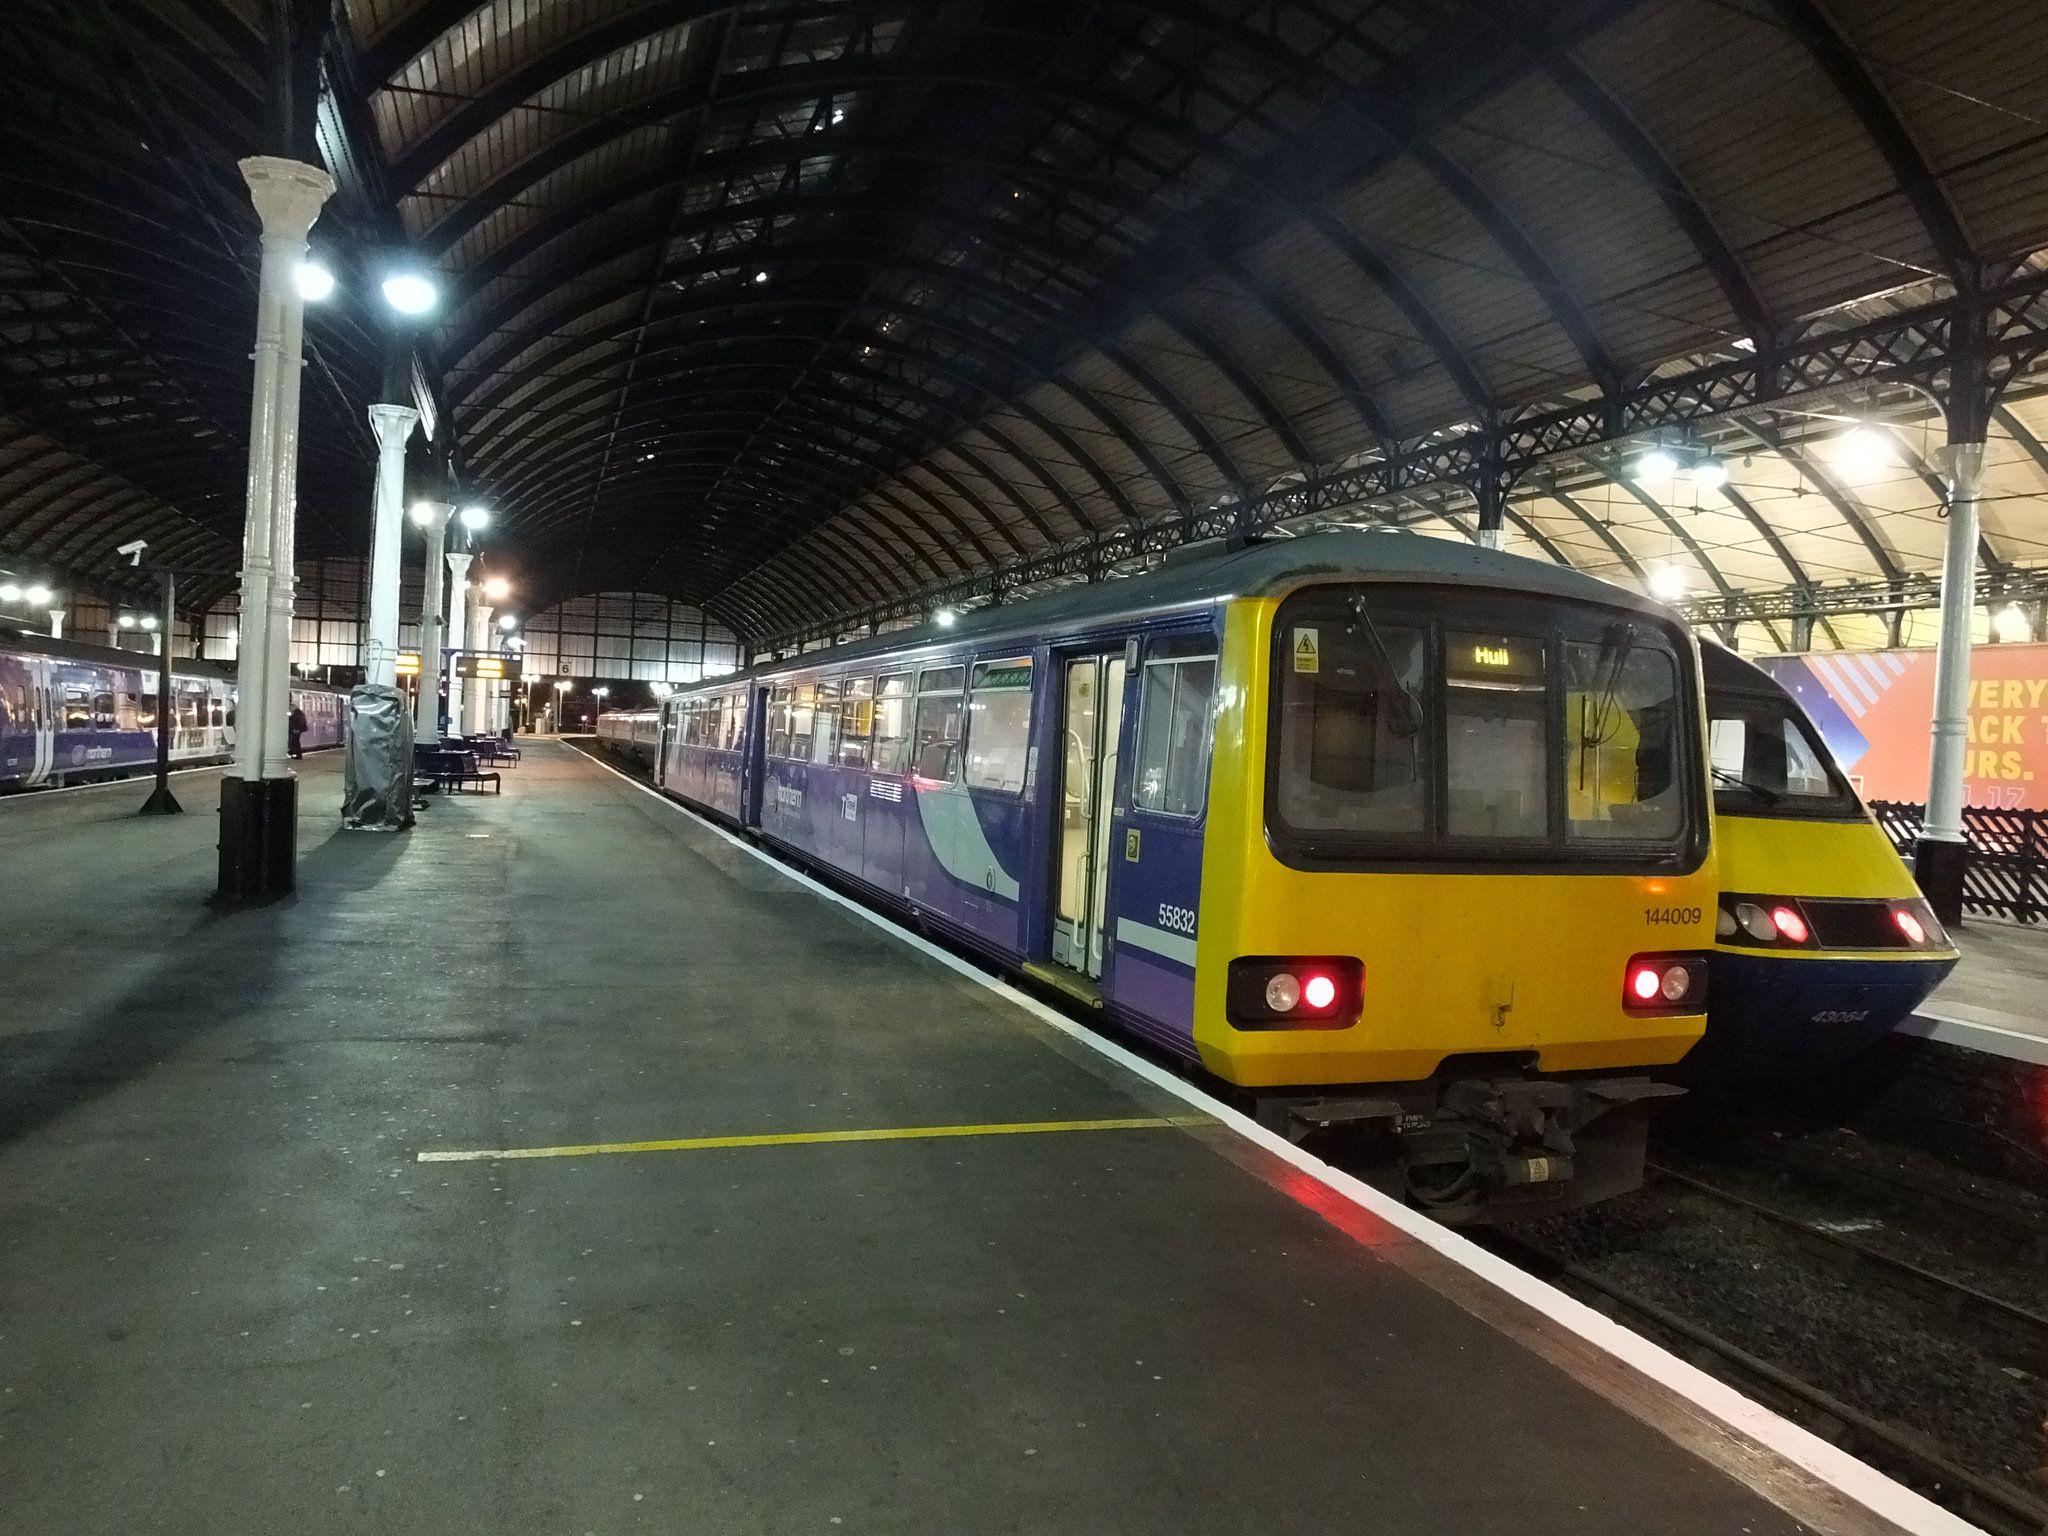 144009 Hull Railway Station Railway Station Railway Northern Rail